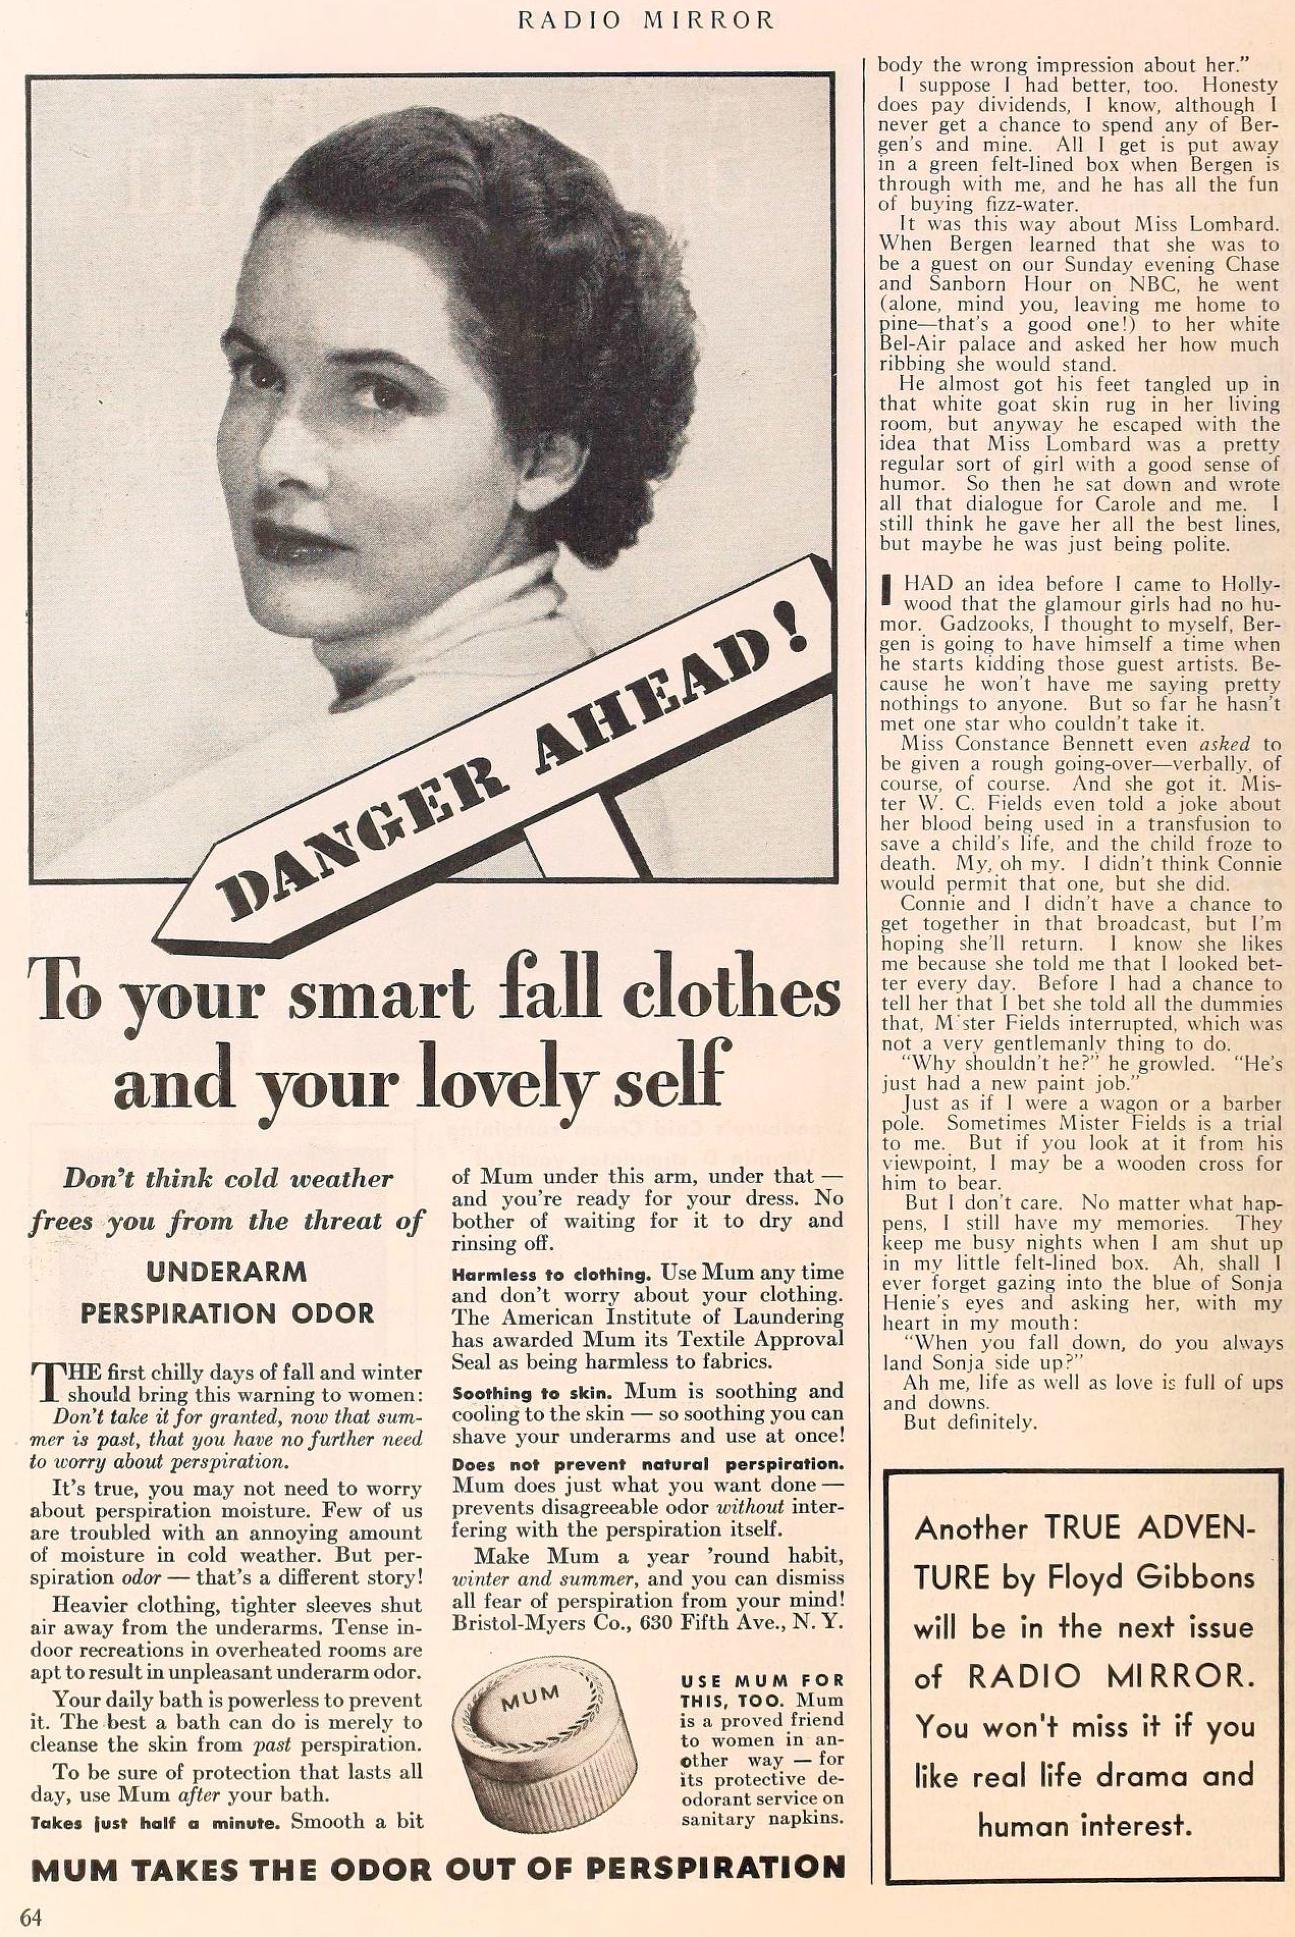 carole lombard radio mirror november 1937ea